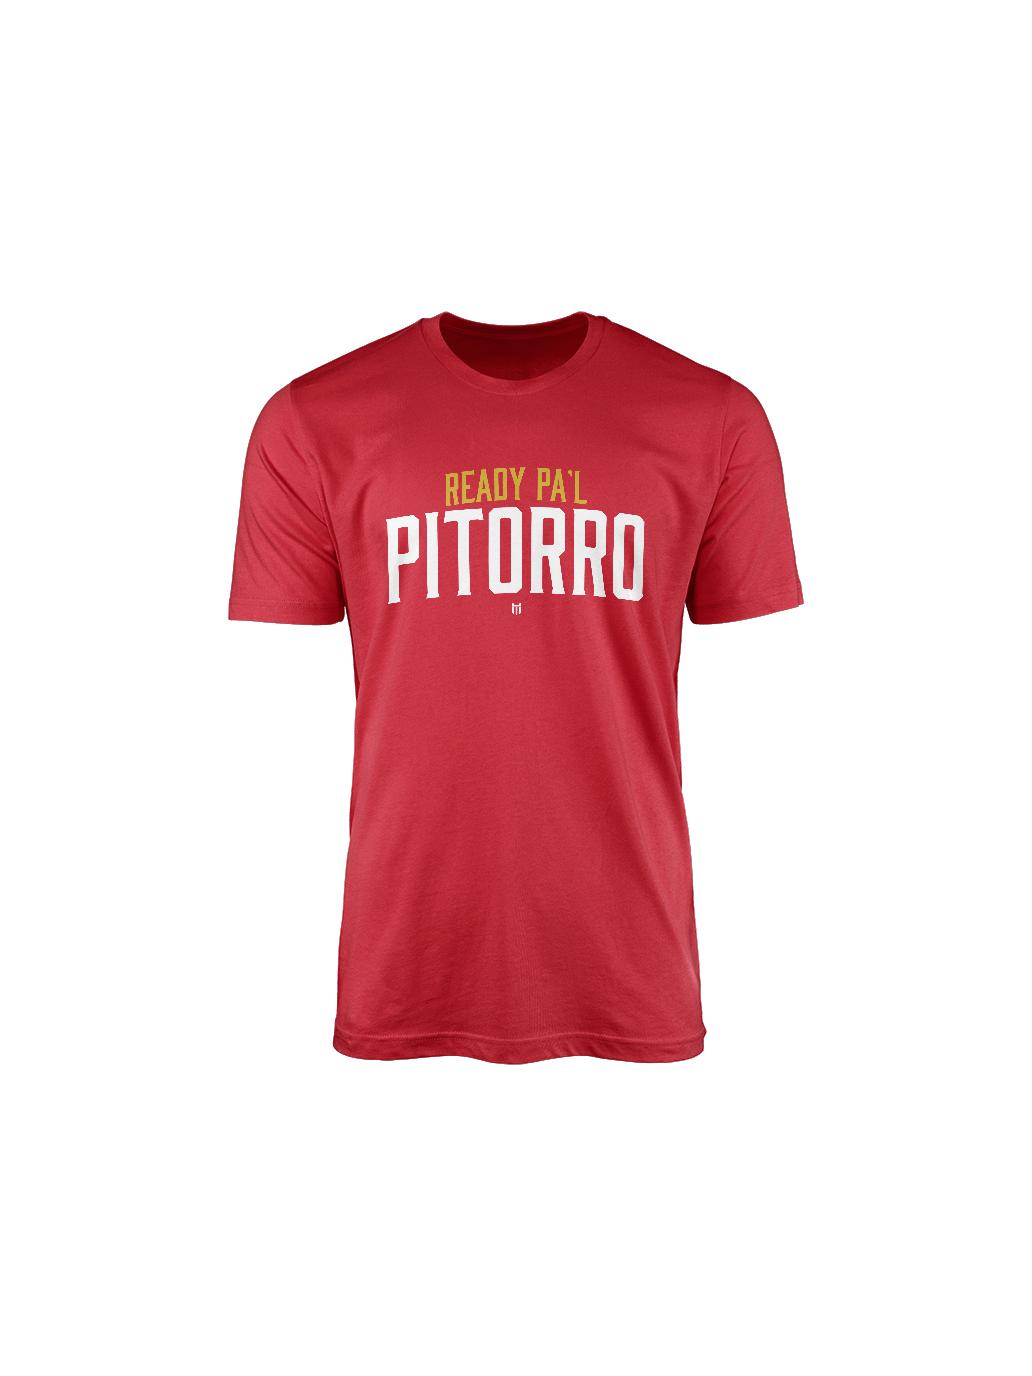 Pitorro Red